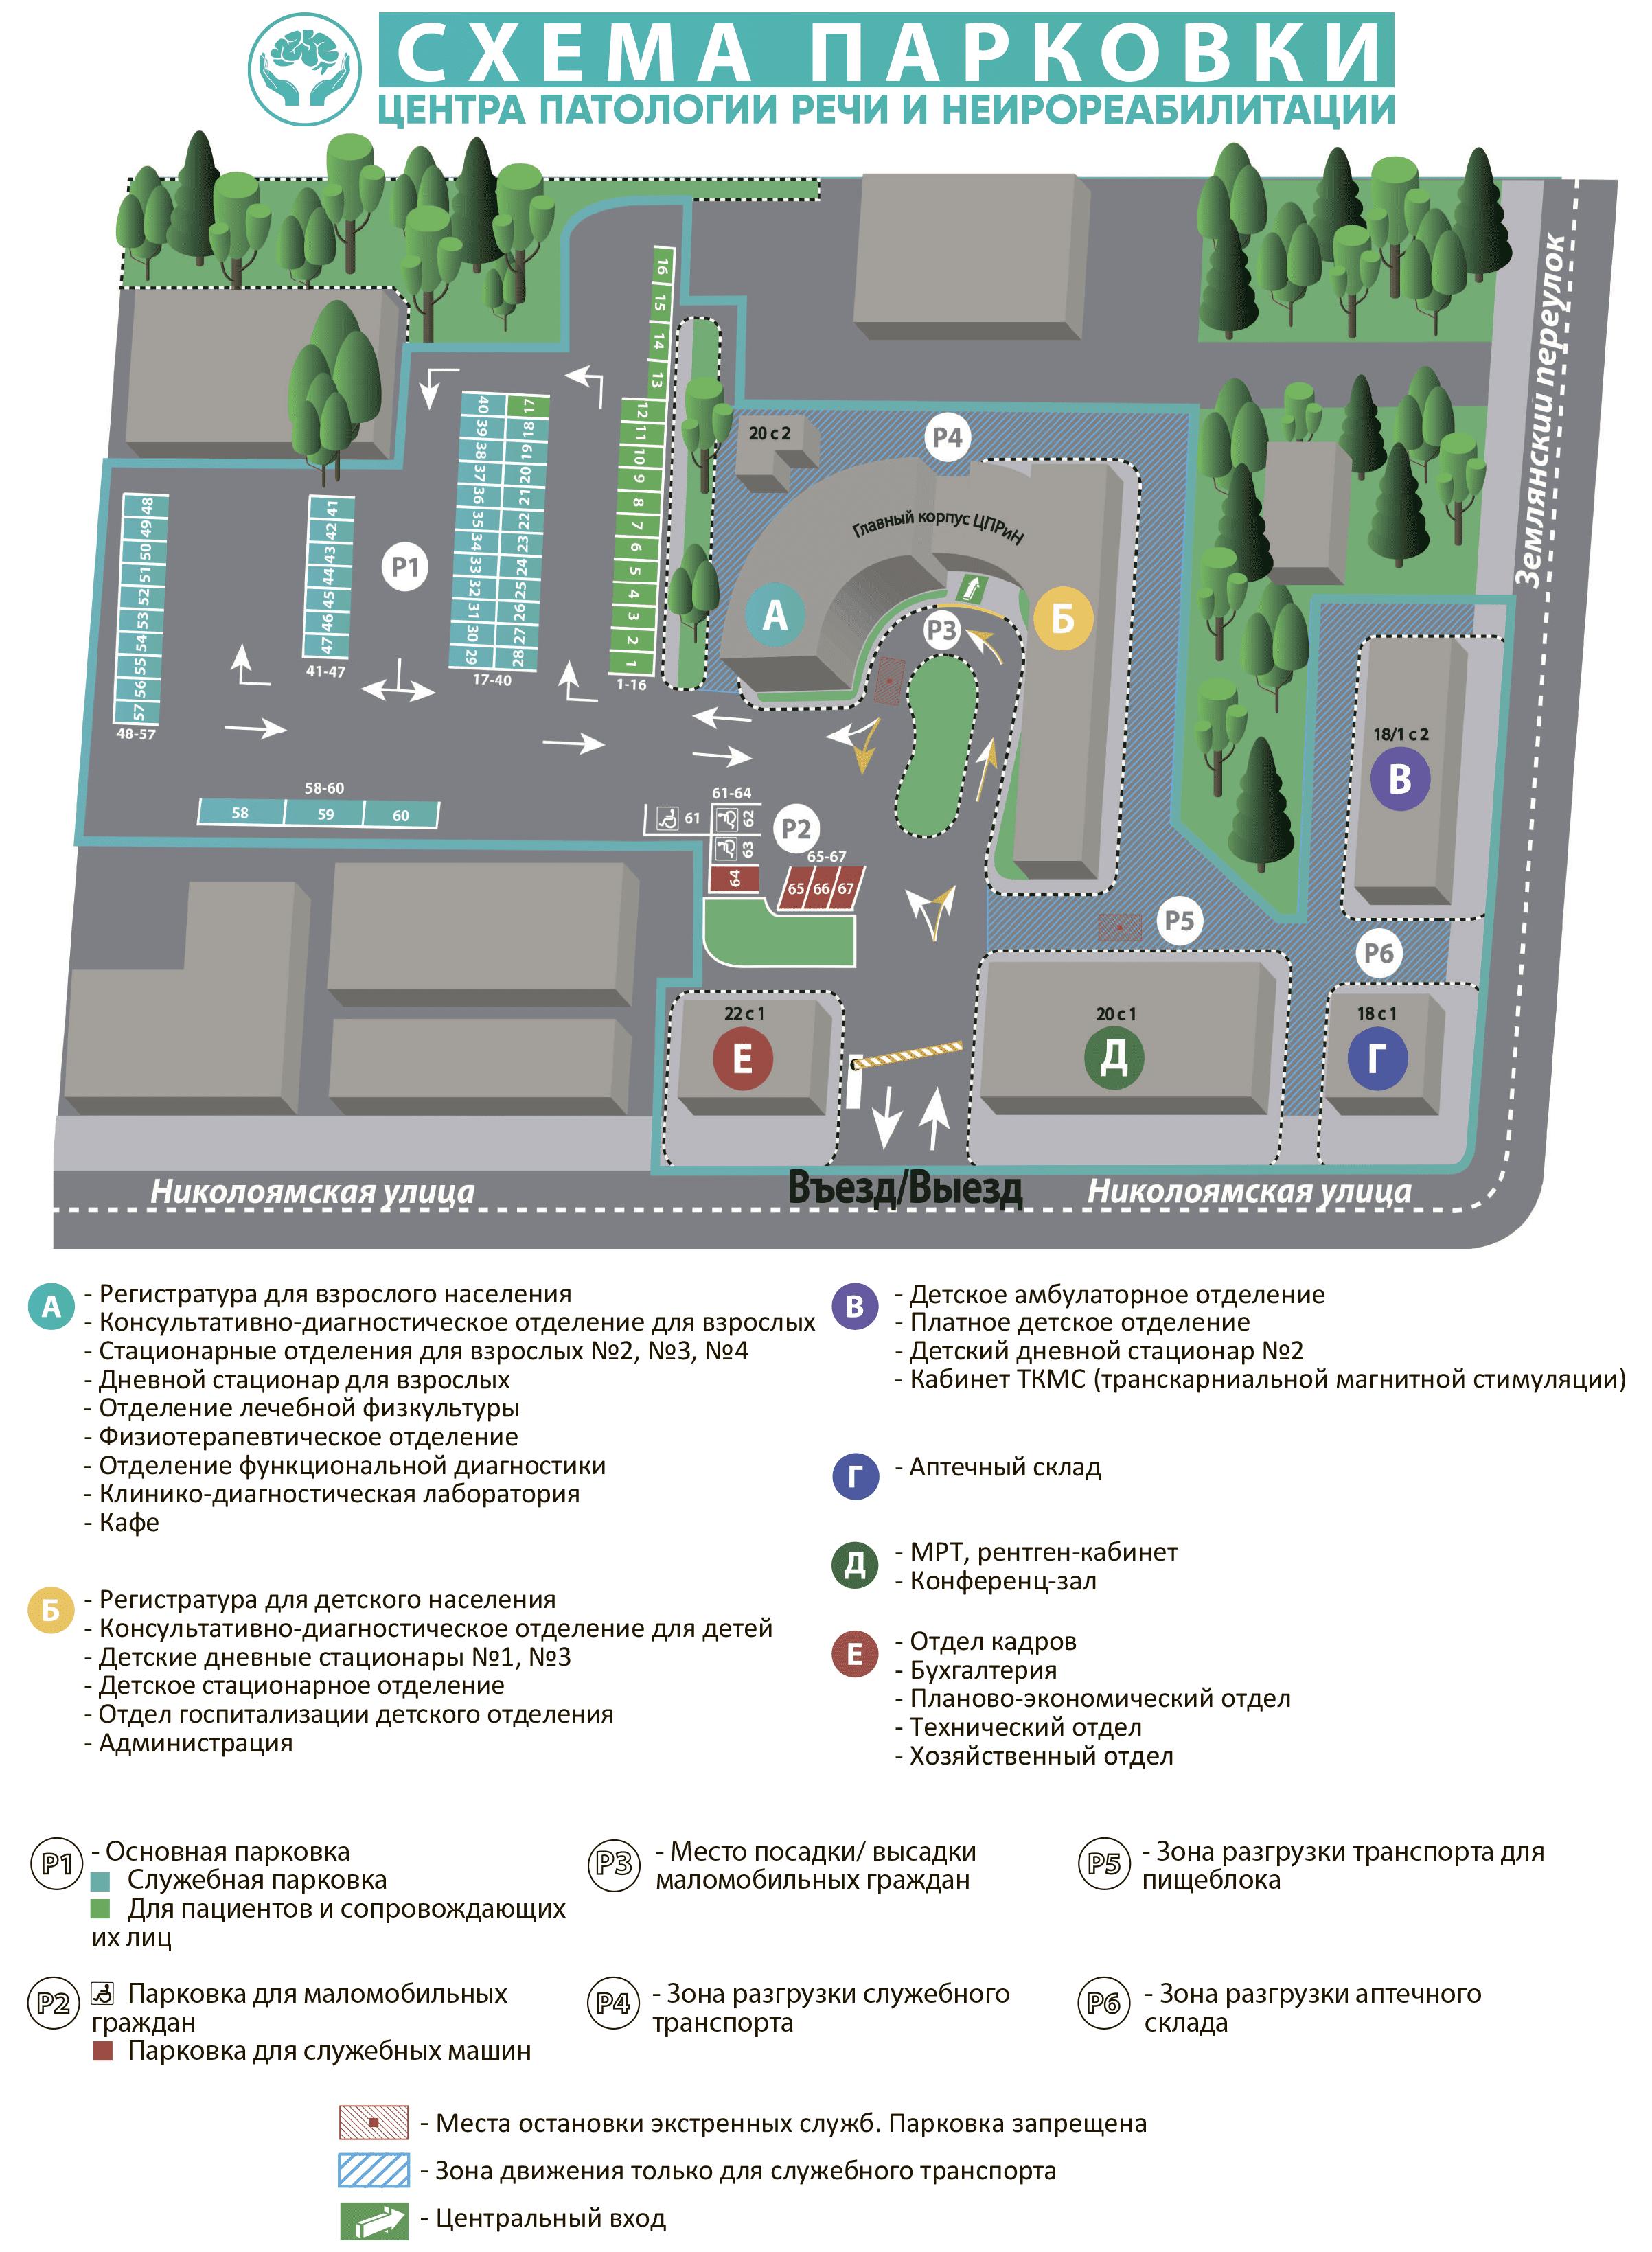 Схема парковки ЦПРиН